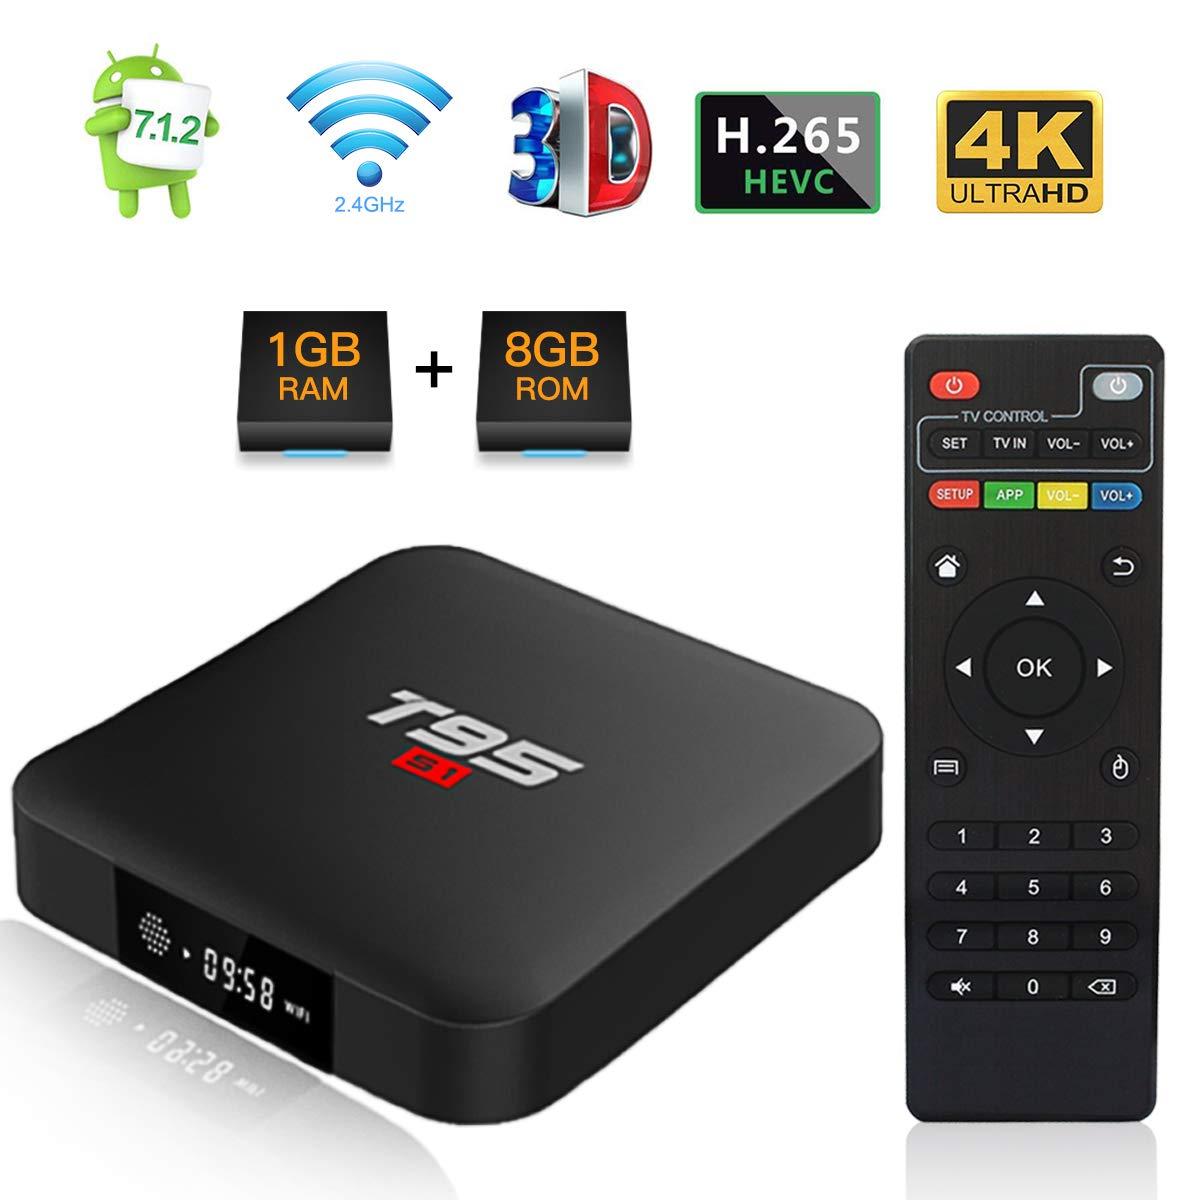 Android 7.1 TV Box, T95 S1 Smart Internet TV Box Amlogic S905W Quad Core 1GB/8GB with Digital Display HDMI Ultra HD 4K Ethernet 2.4GHz WiFi H.265 Video Decoder